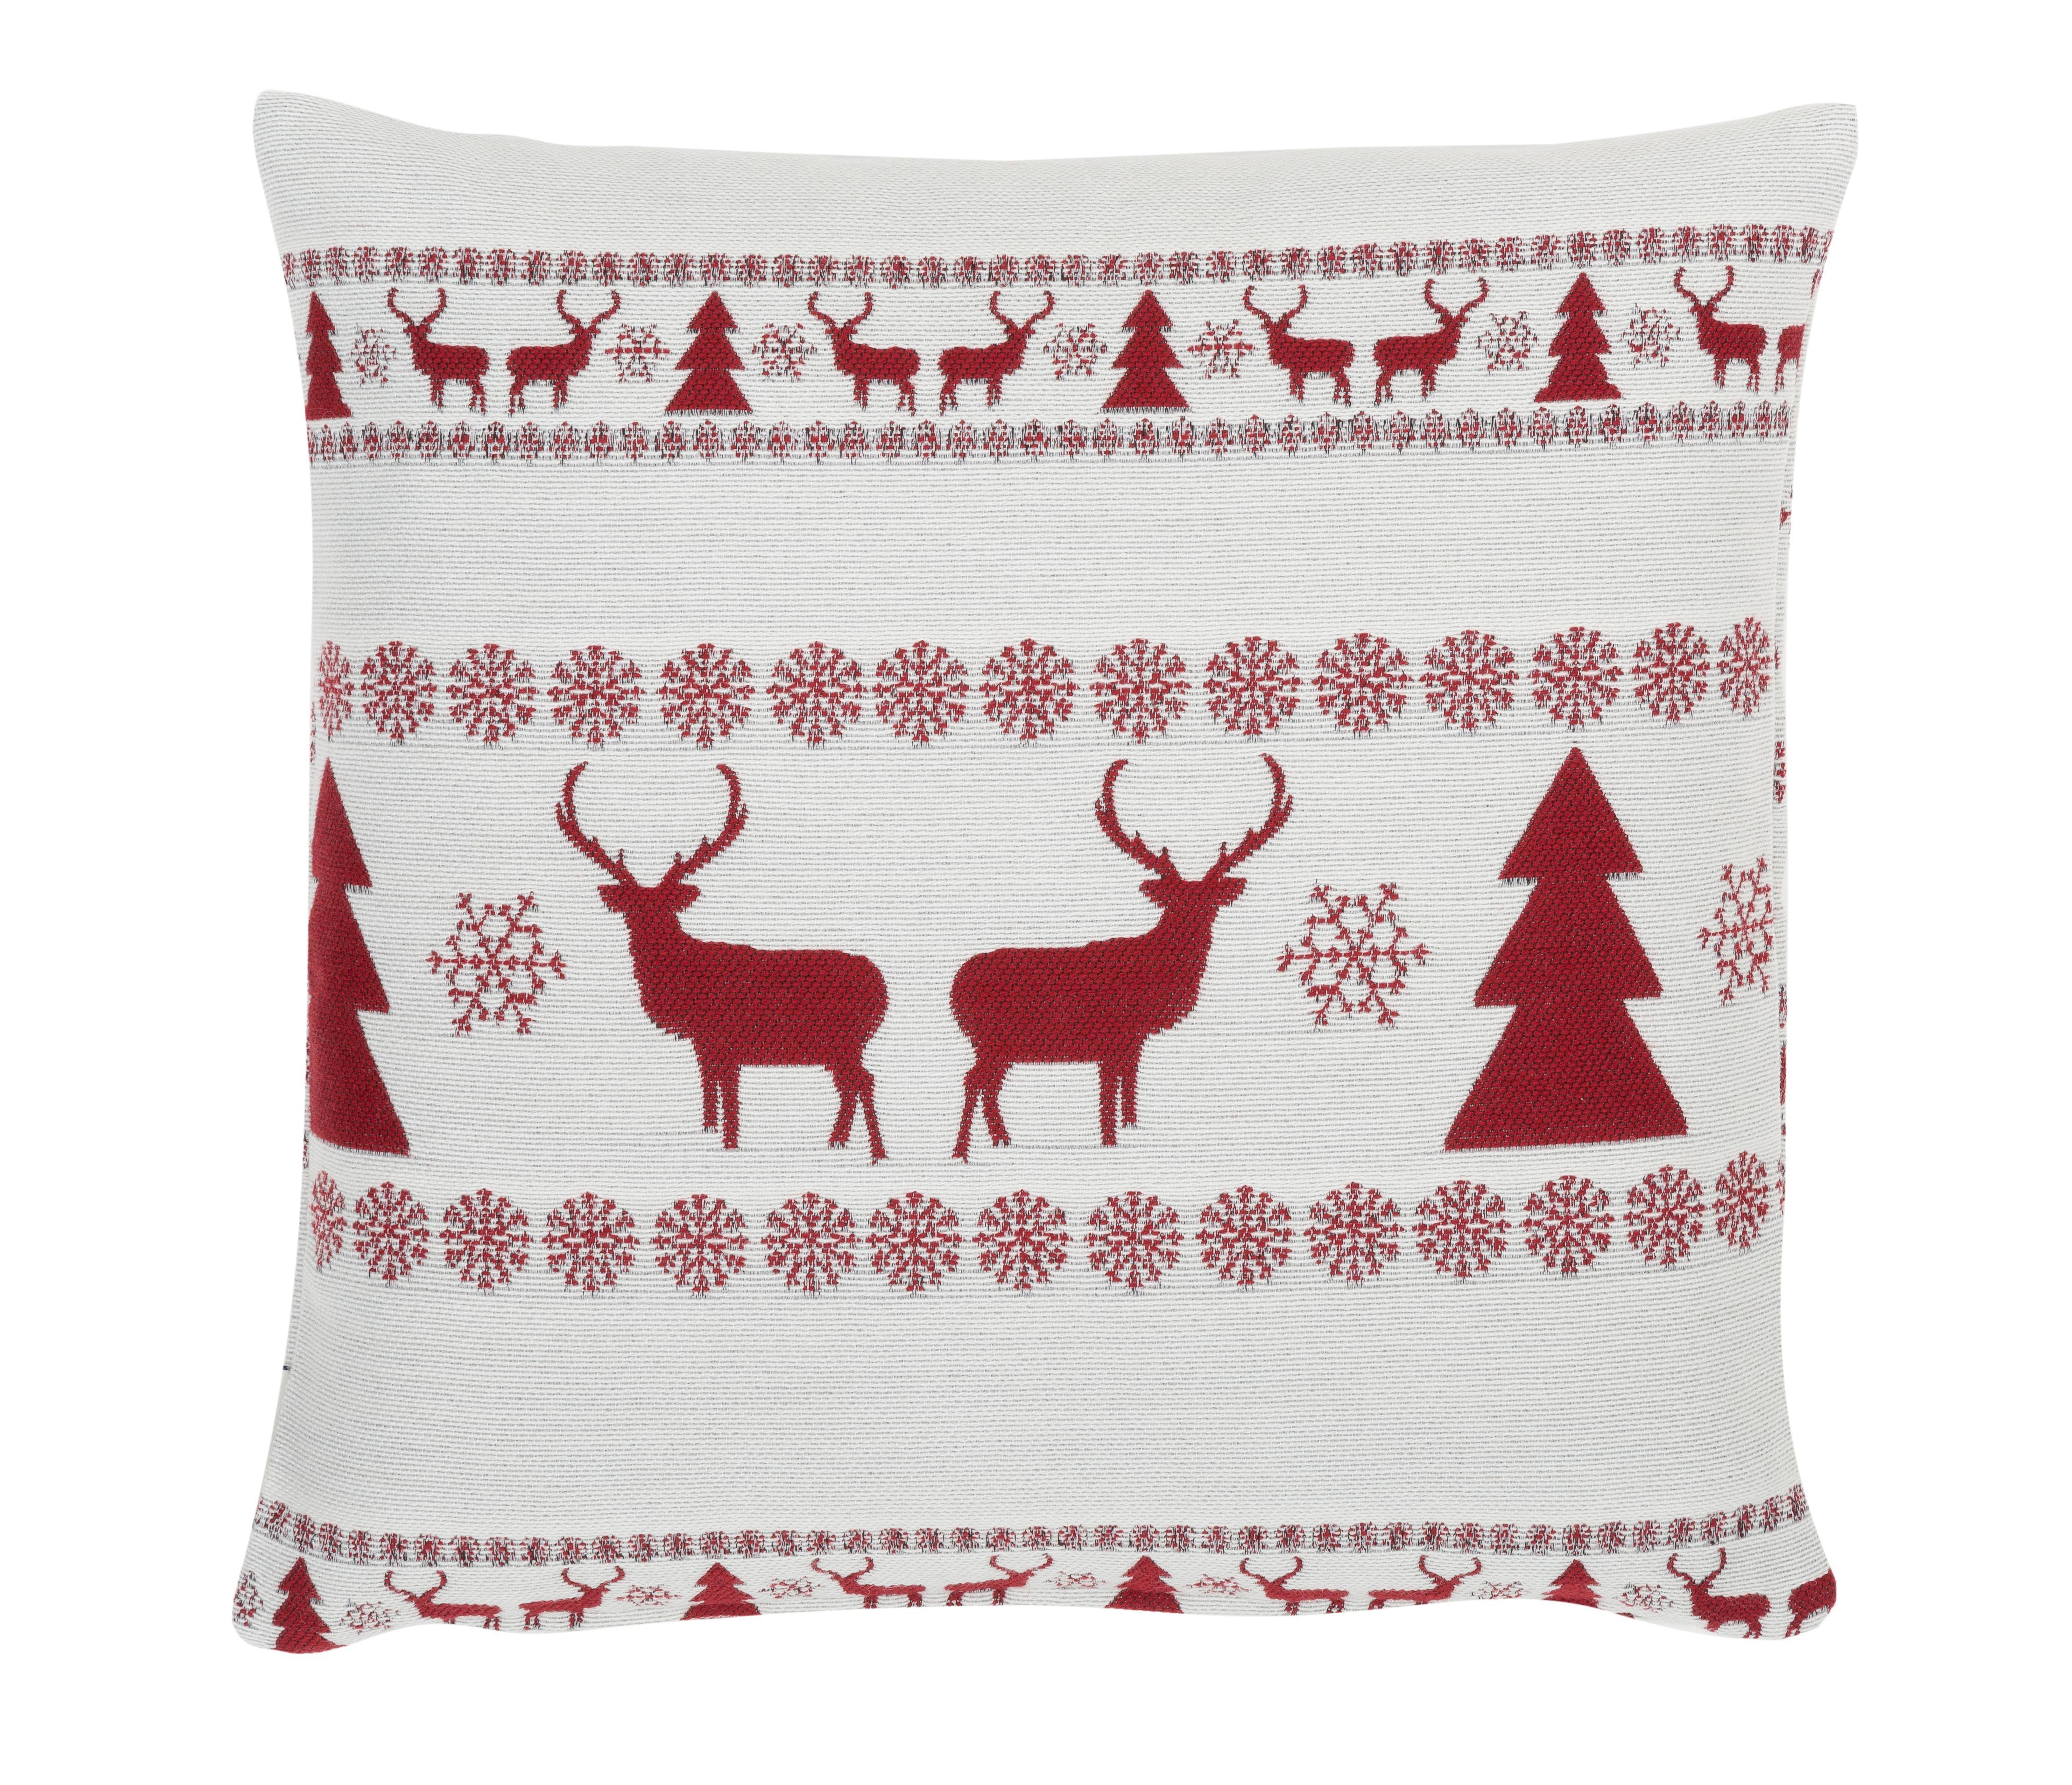 Kissenhülle Nordic Winter mit weihnachtlichem Muster, 56% Polyester, 31% Acryl, 13% Wolle, Cremeweiß, Rot, 45 x 45 cm